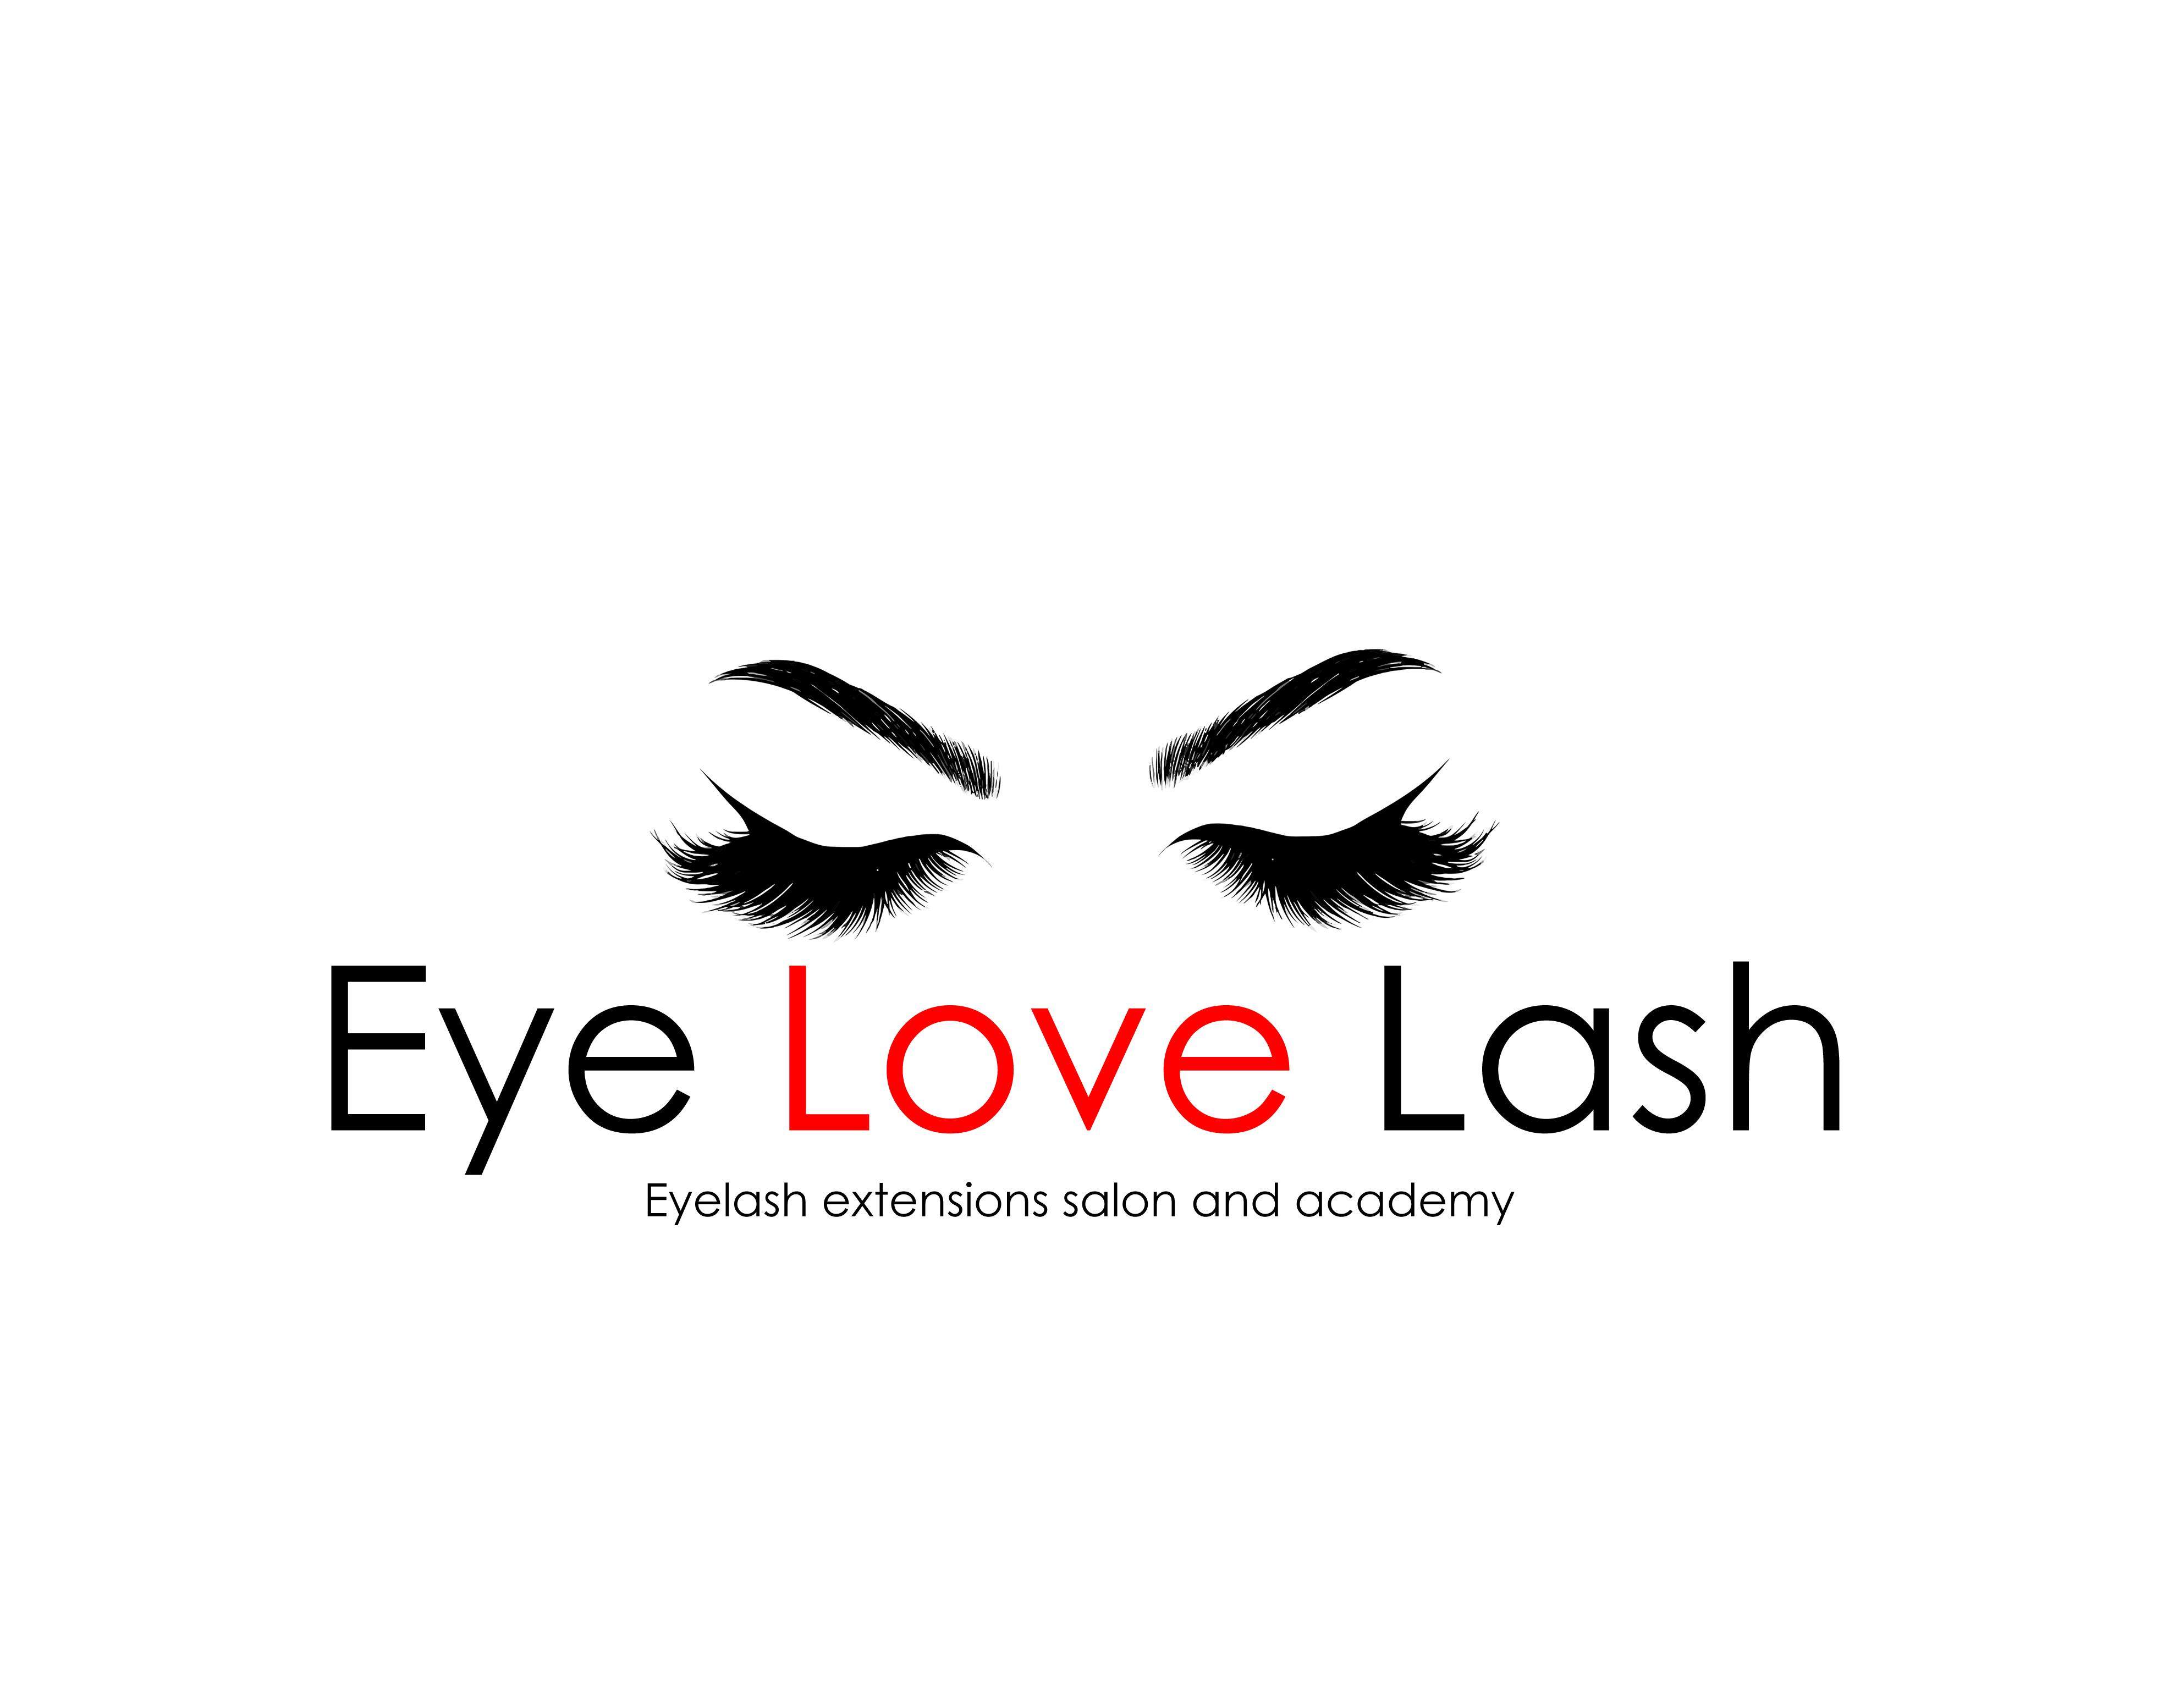 Eyelash Extensions Barrie Eye Love Lash Salon And Academy